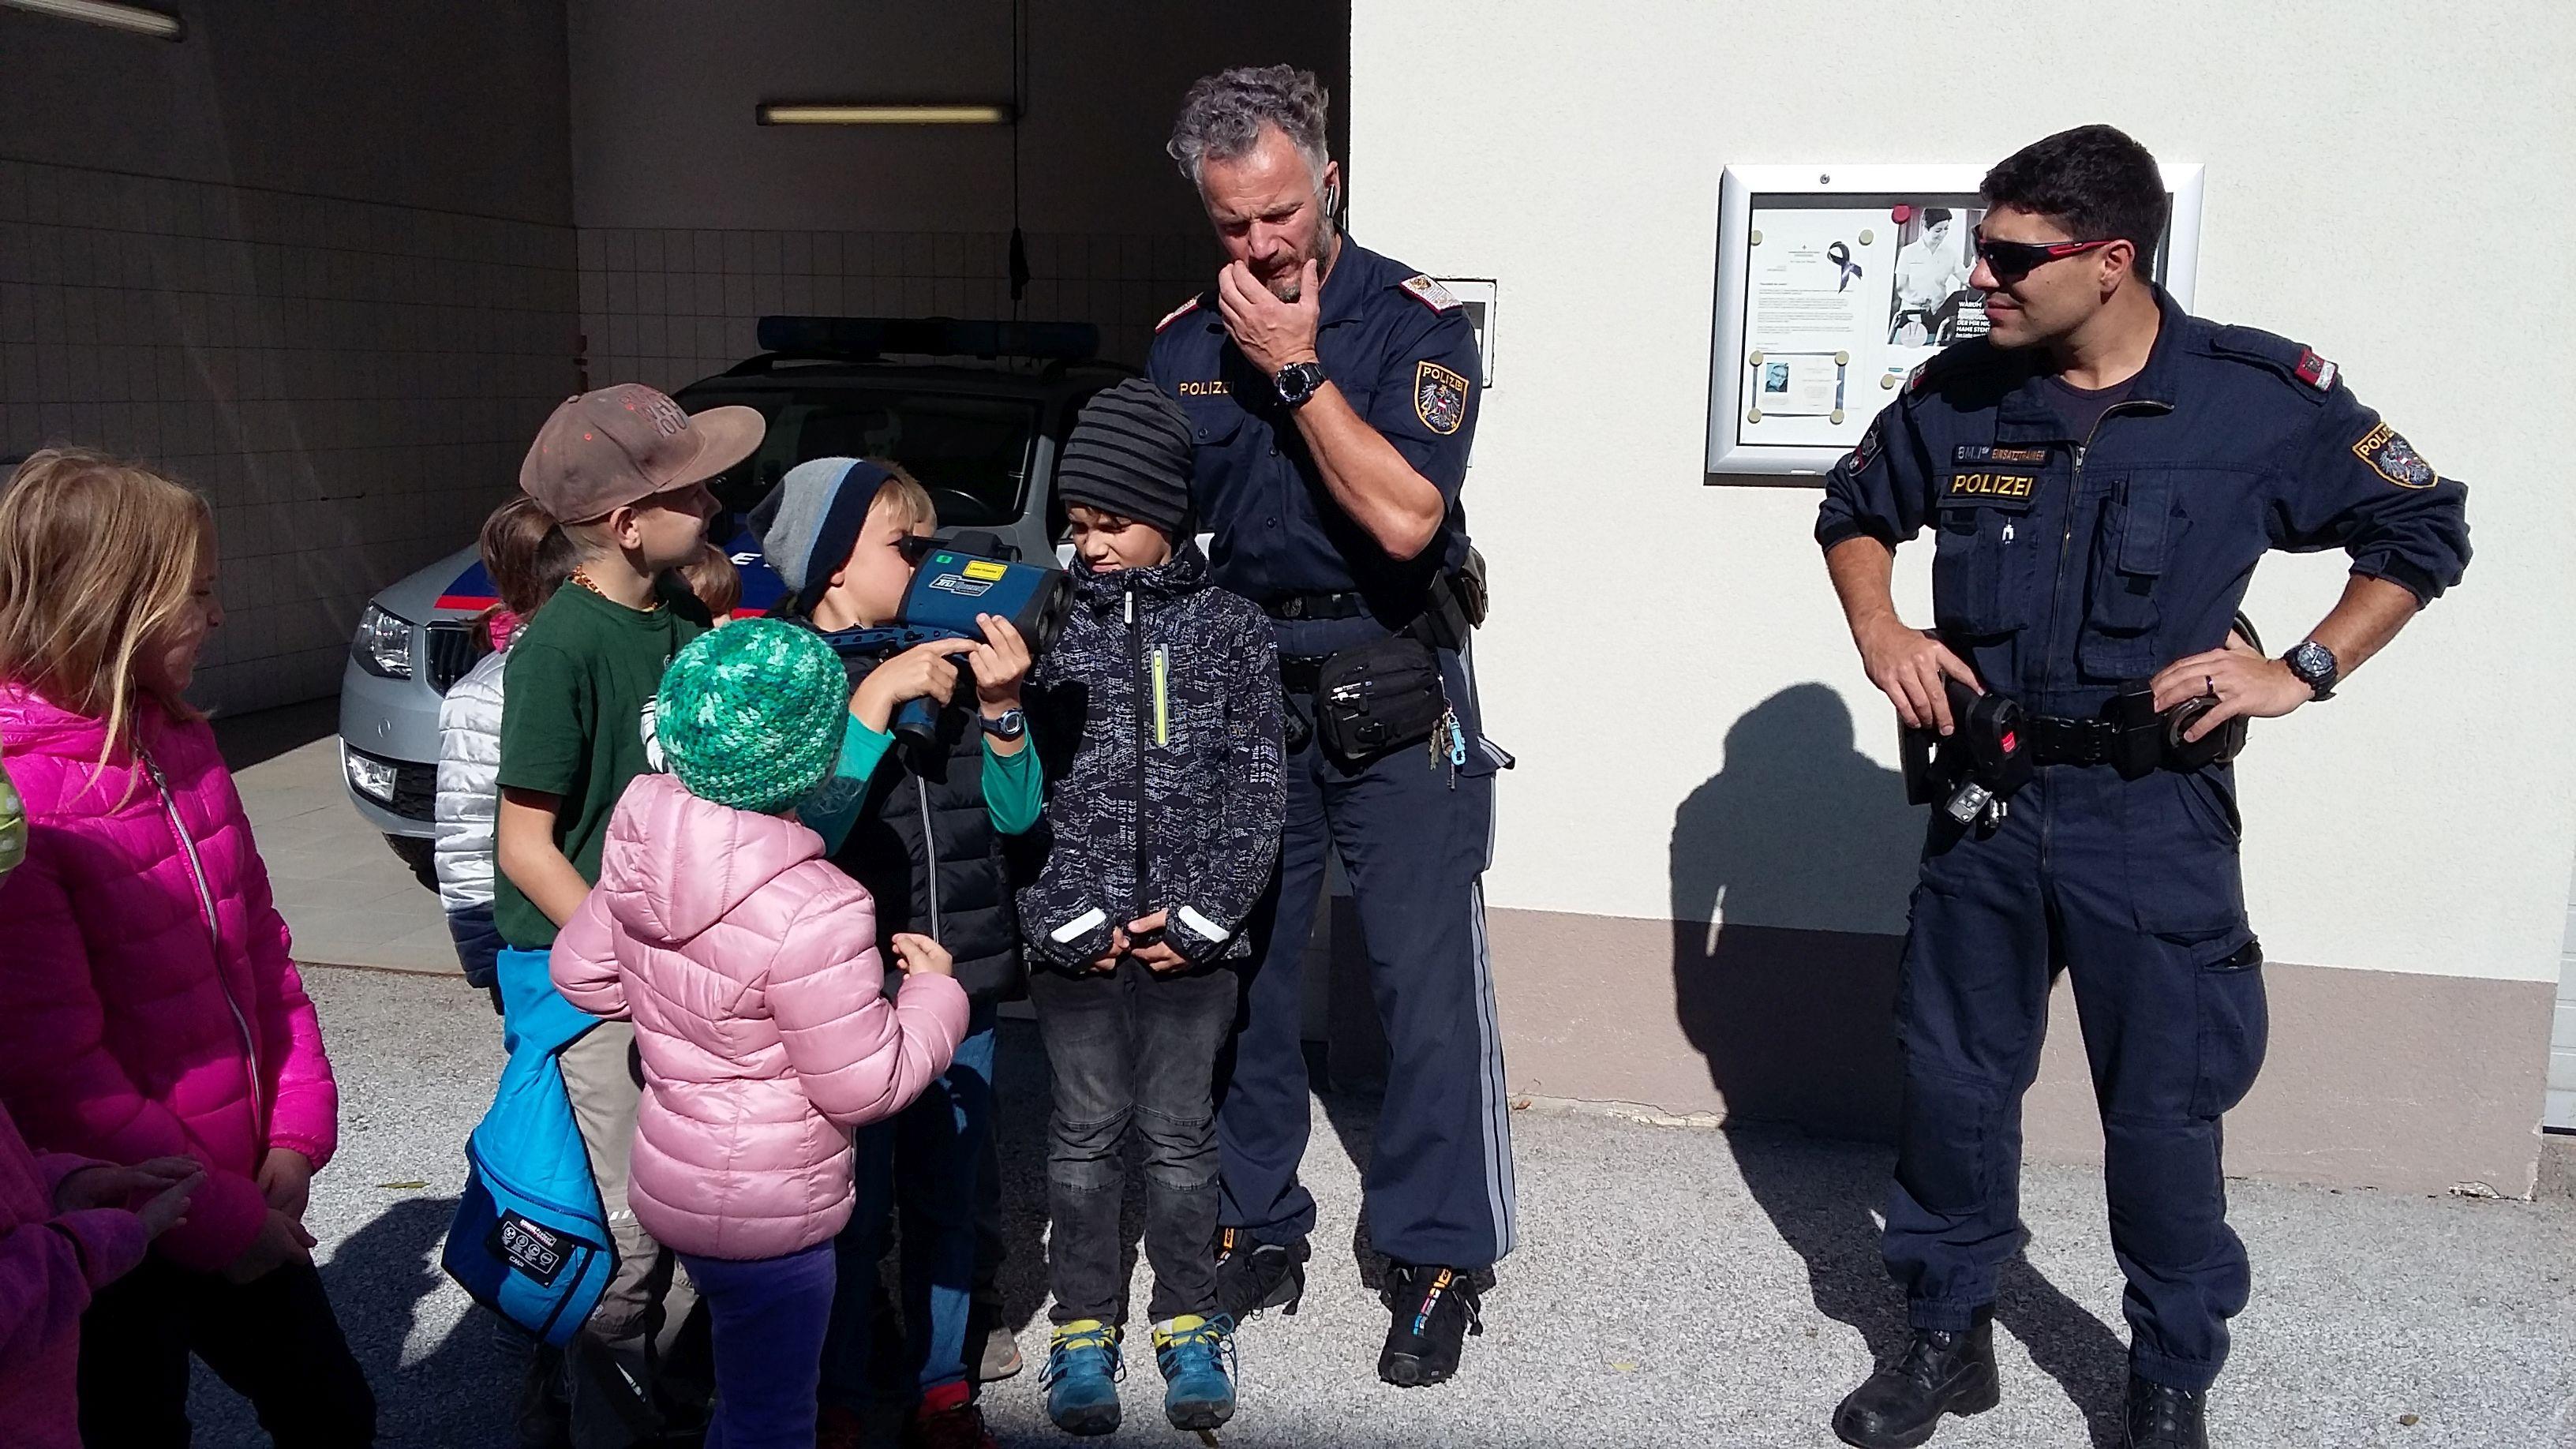 Polizei201810013